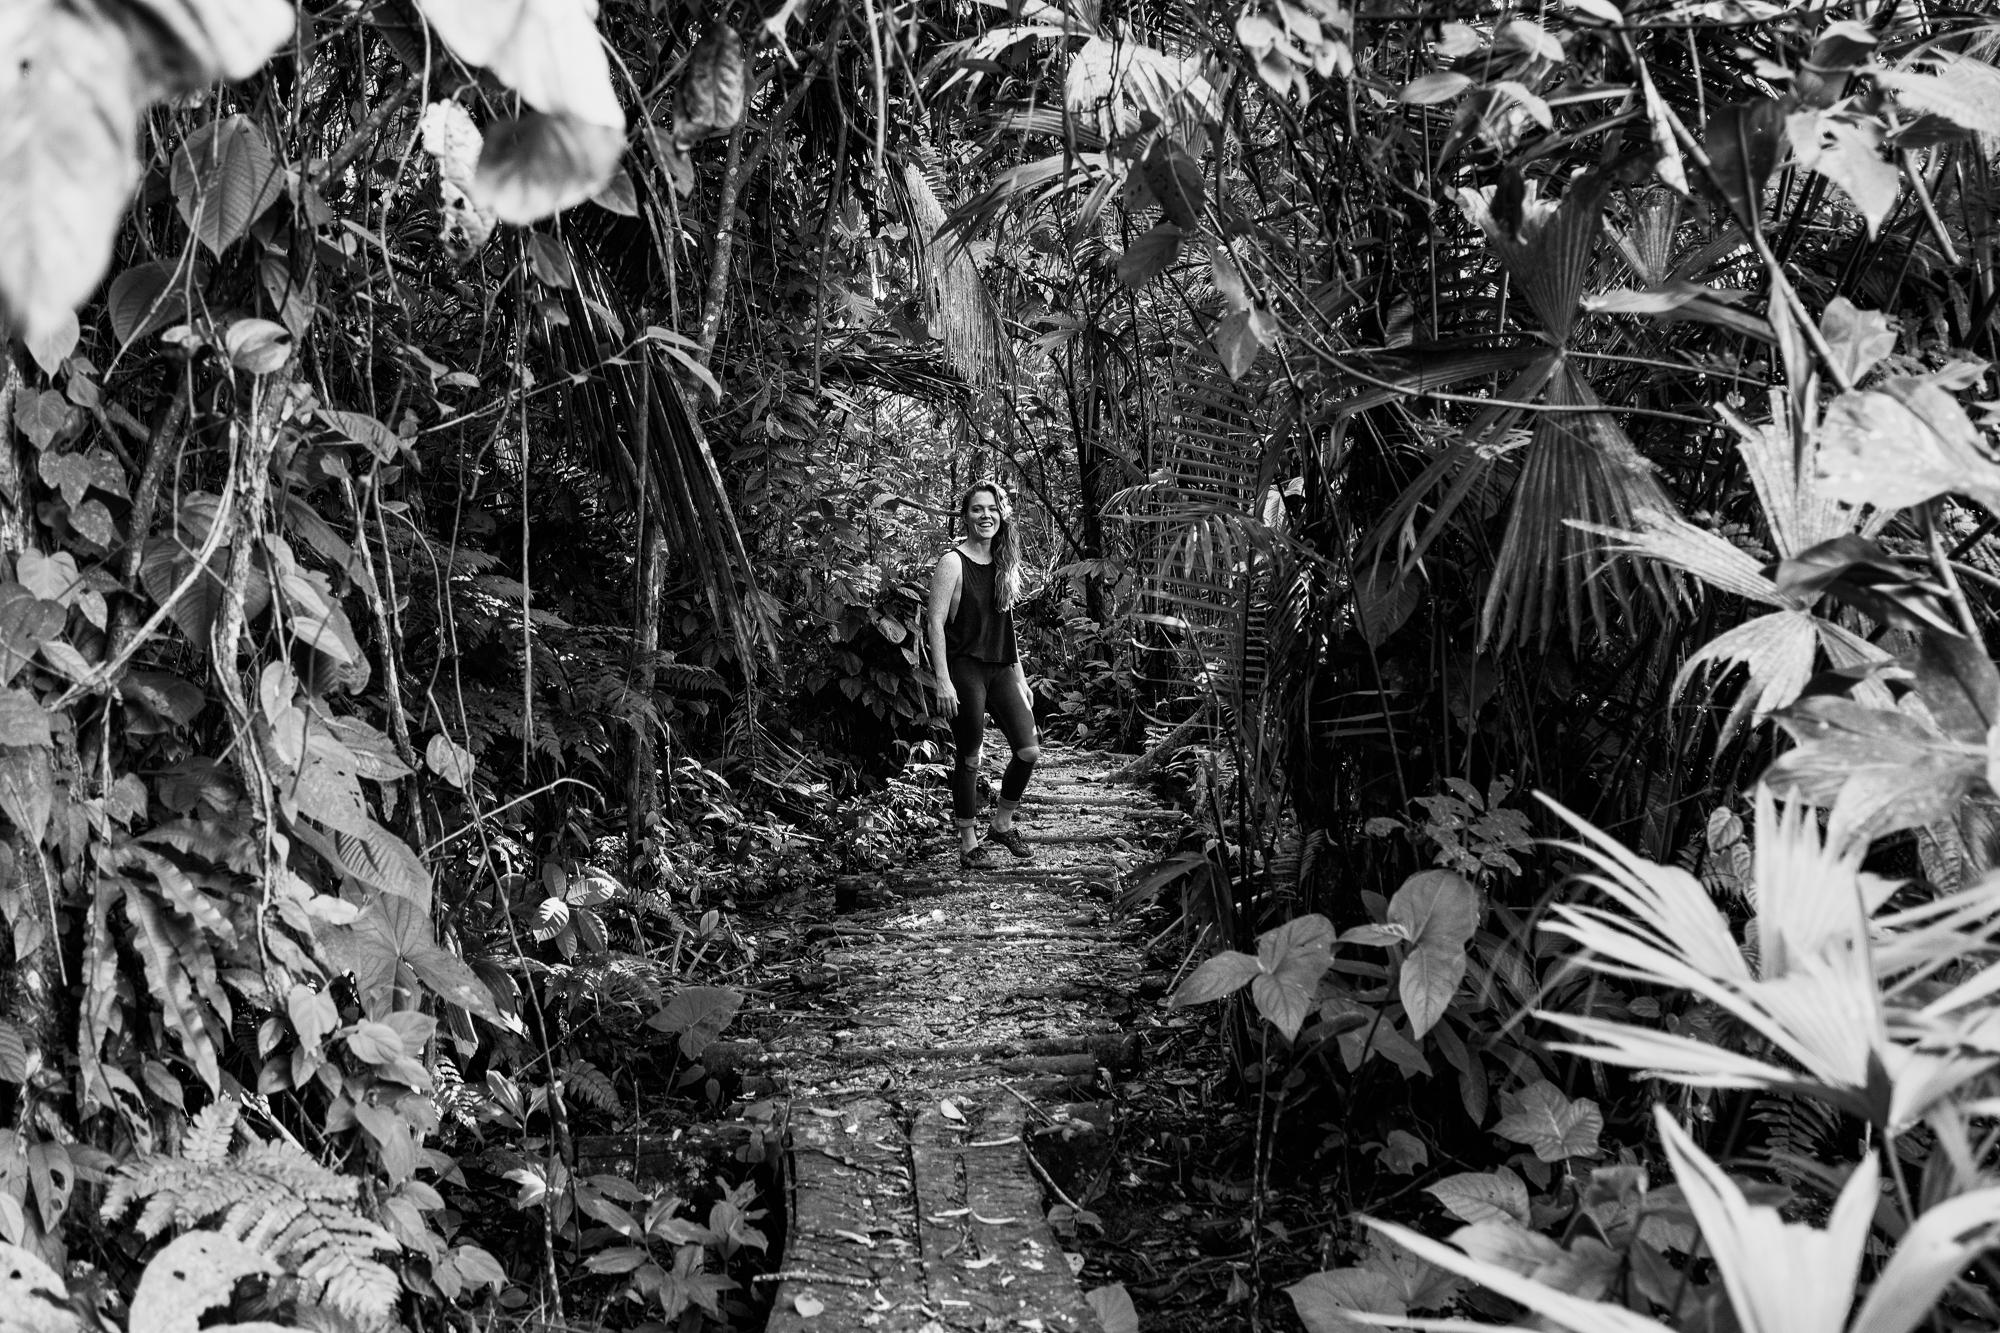 20170210-Ariane-Cassidy-Hannah-Amazon-jungle-FUJIFILM-X-Pro2-0093-Edit.jpg